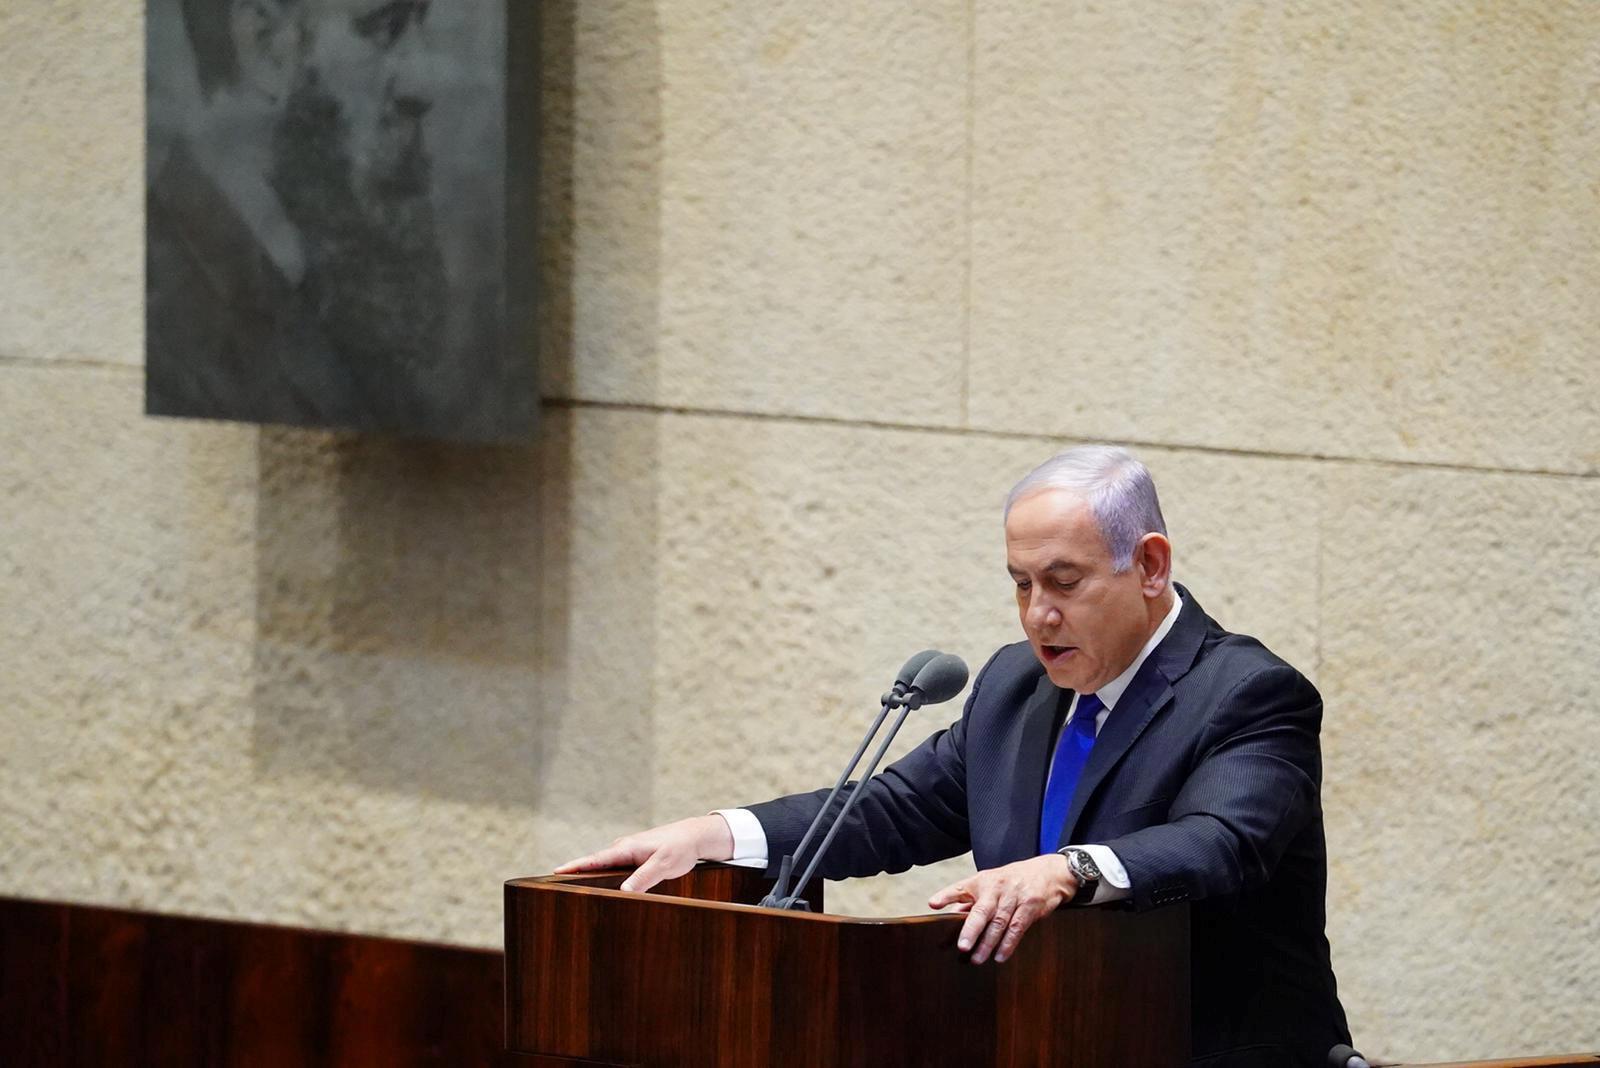 2020-05-17T111022Z_847441704_RC2BQG9Y8F6S_RTRMADP_3_ISRAEL-POLITICS-GOVERNMENT